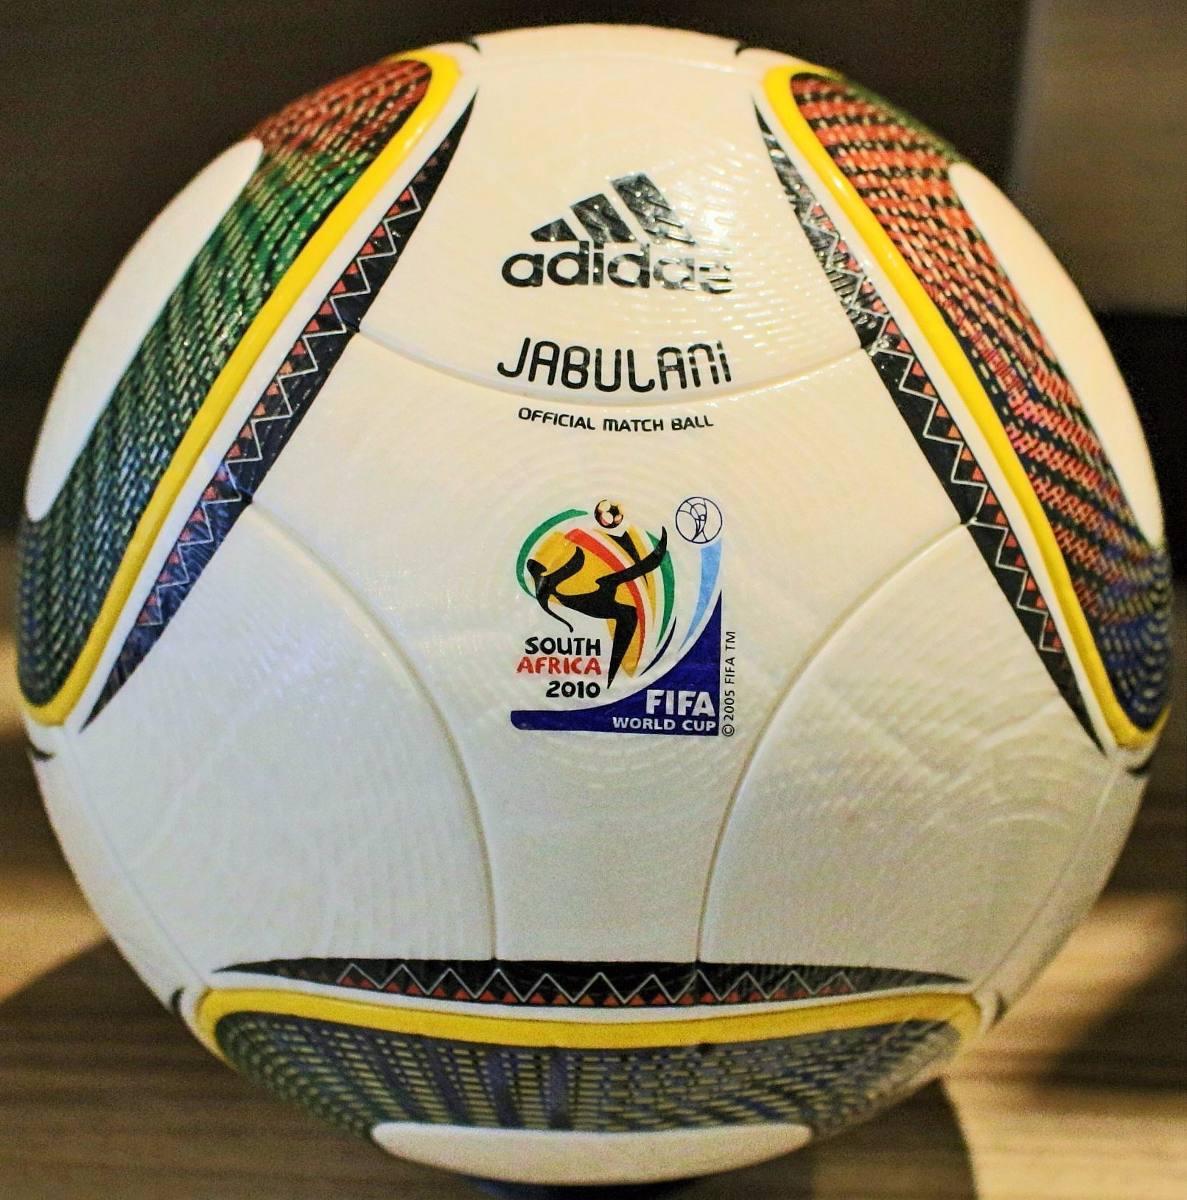 1eda87fda6 linda bola adidas jabulani oficial de jogo copa 2010. Carregando zoom.